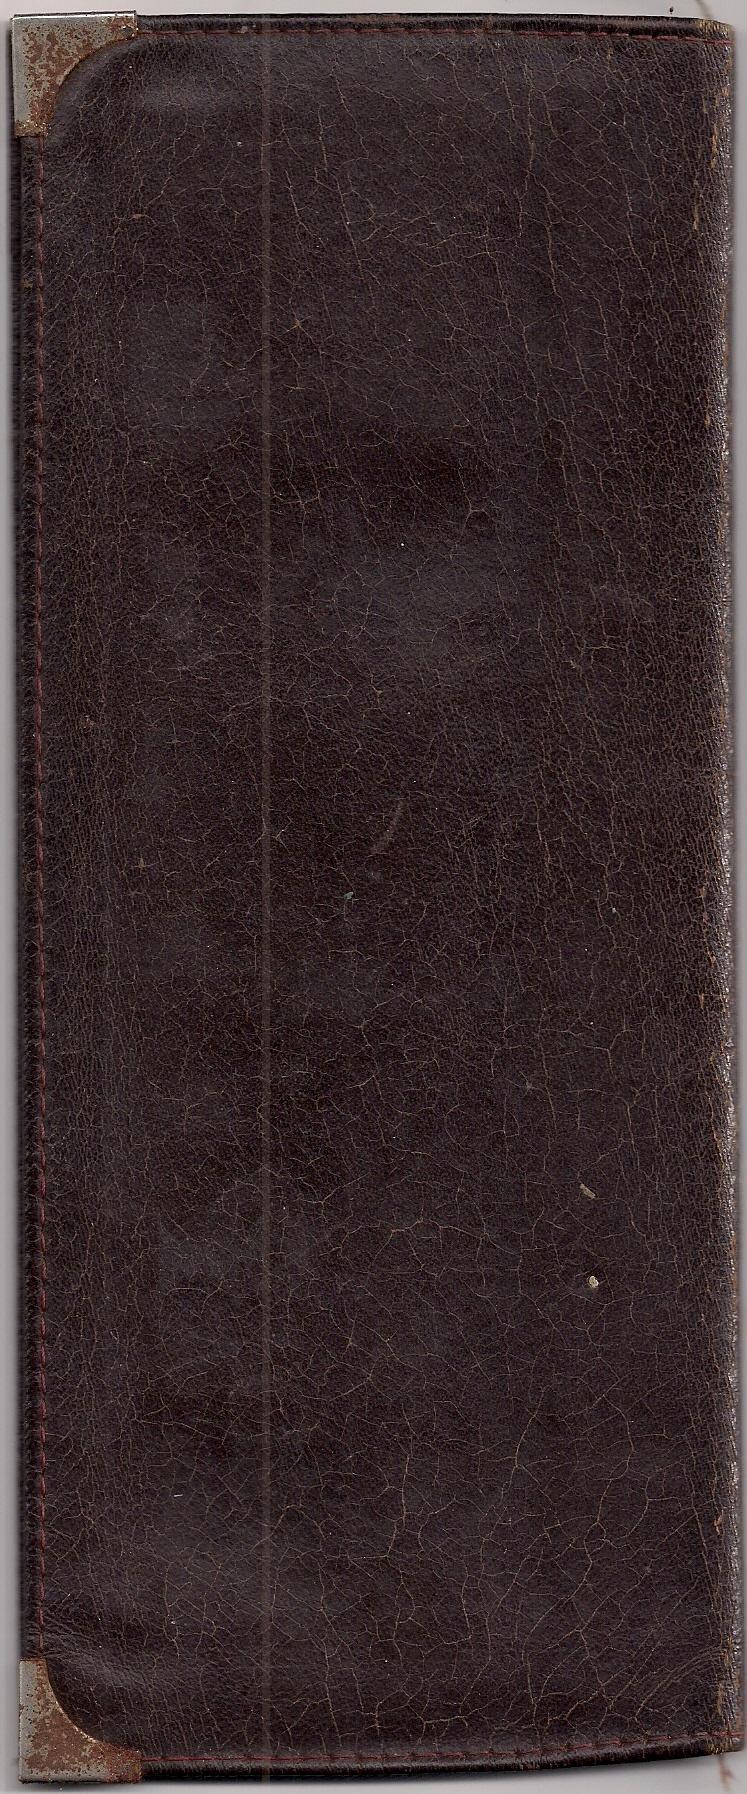 leather 002 by HowToPeelAnOrange